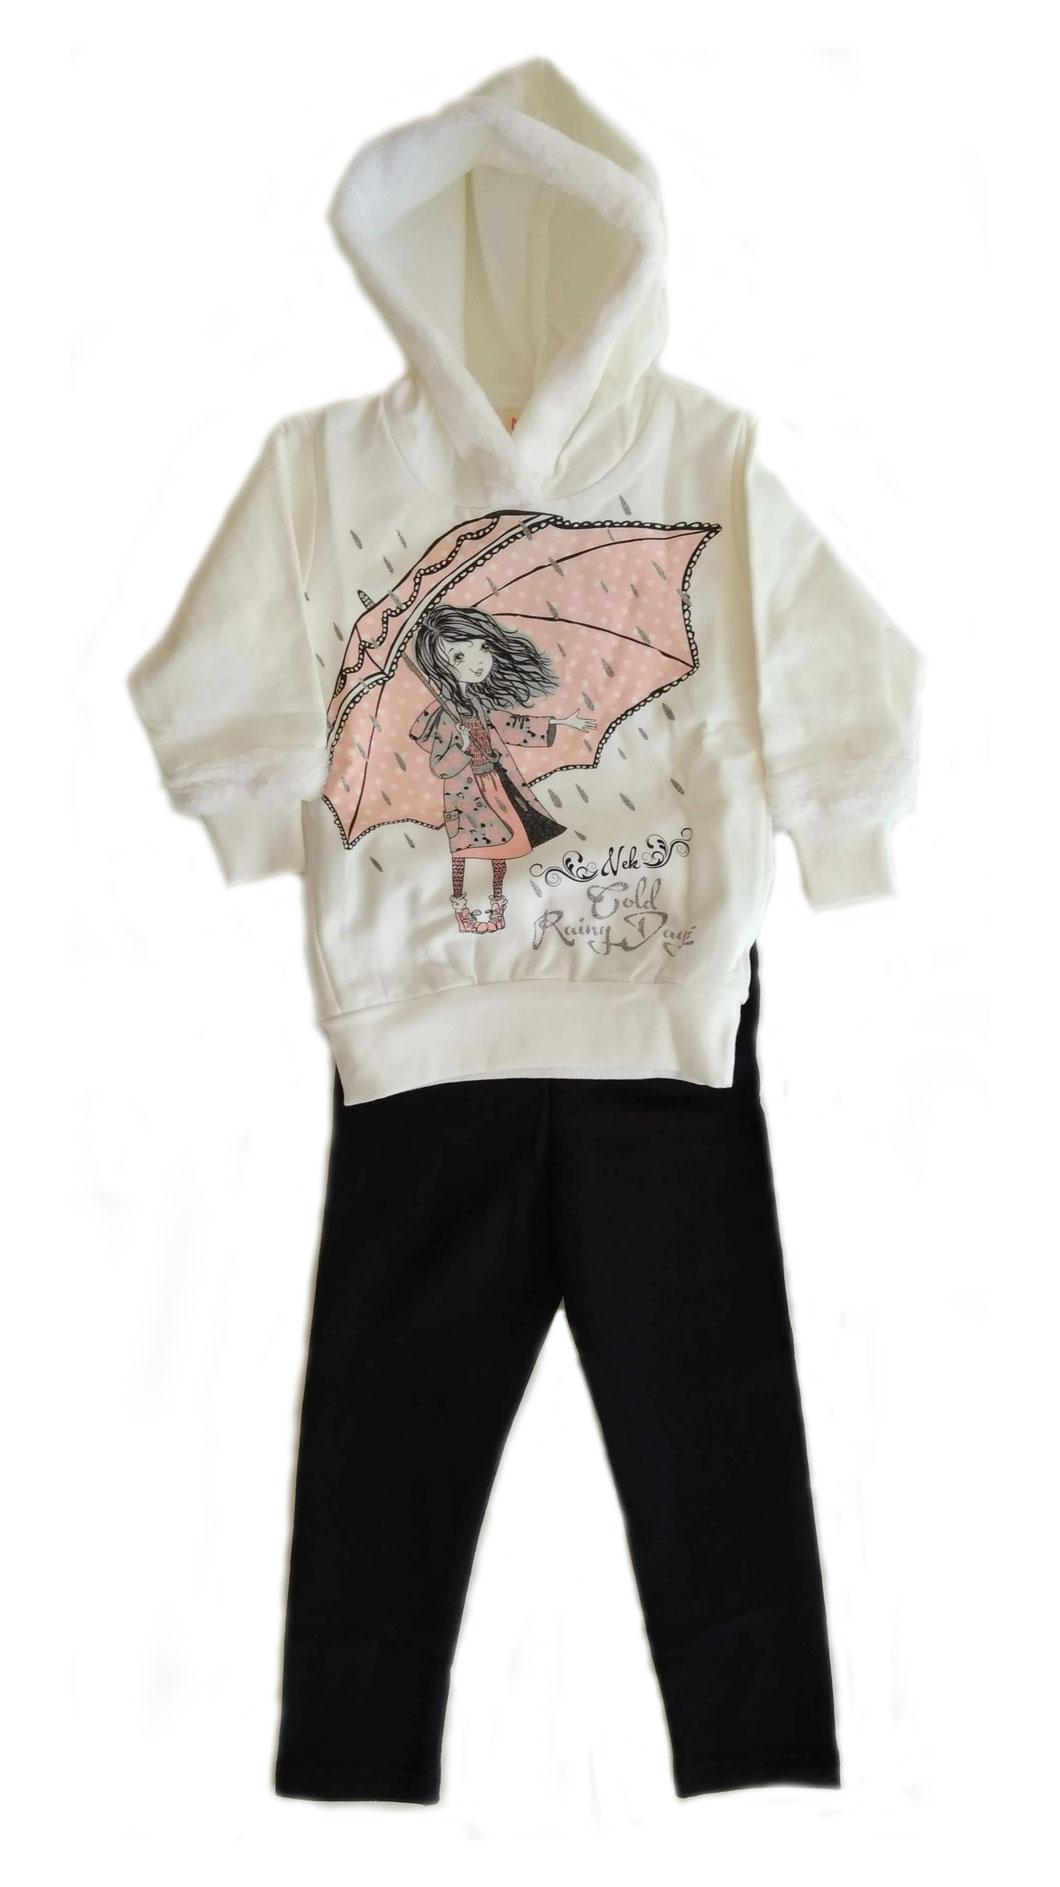 7edf5b8c6058 Χειμωνιάτικο σετ ρούχων για κορίτσι με κουκούλα και γουνάκι - Baby 03